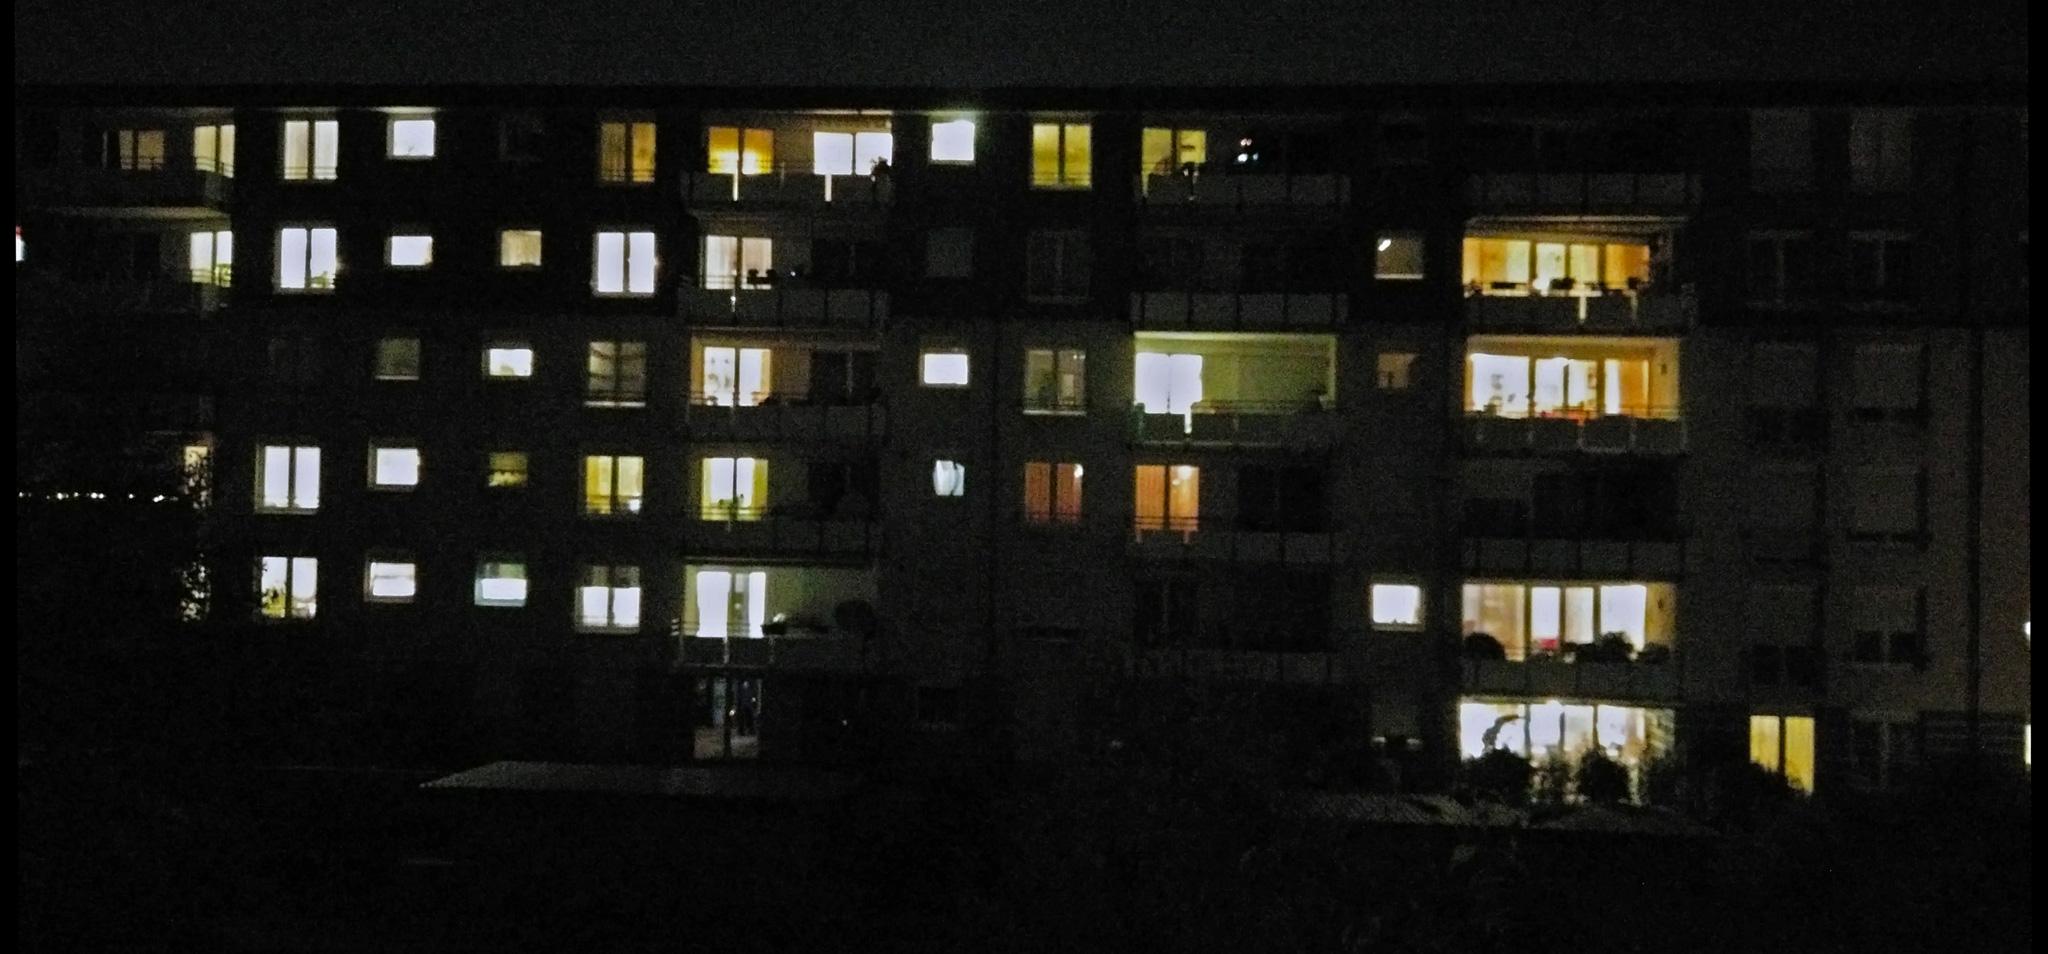 Felix 39 welt nacht camping - Nasse fenster uber nacht ...